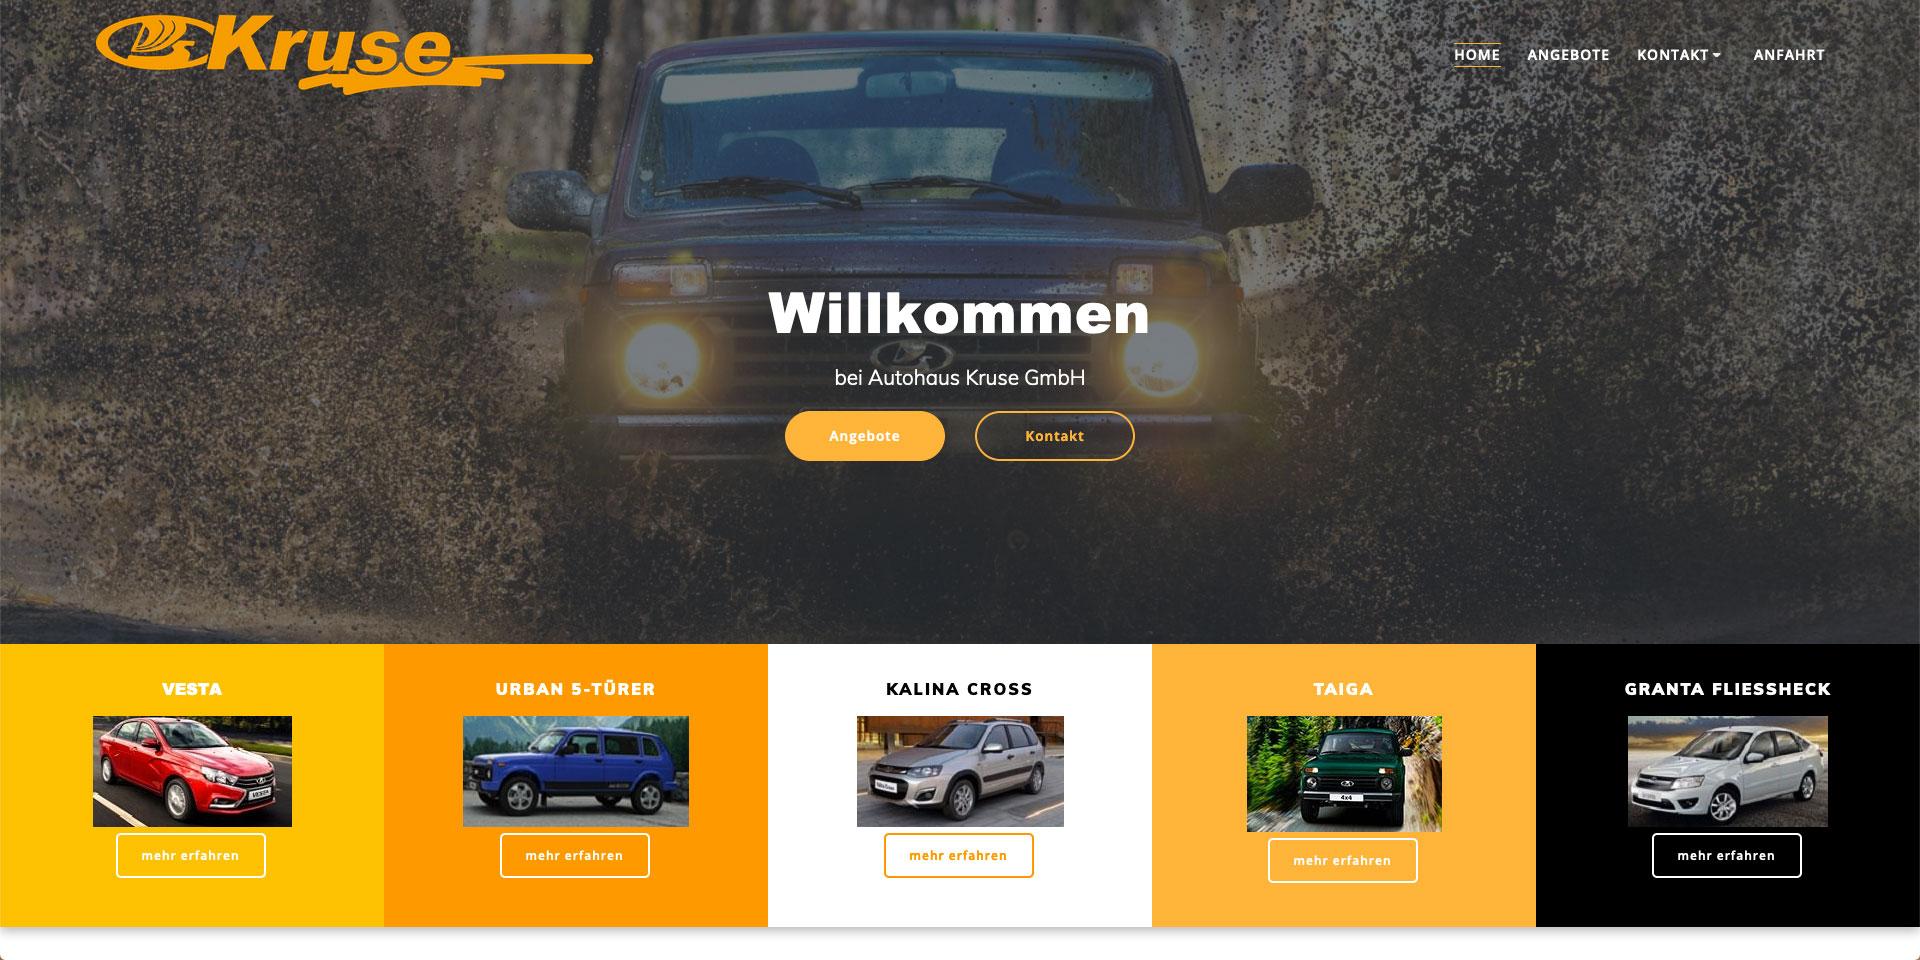 Webpräsenz, Webgestaltung, Autohaus Kruse GmbH